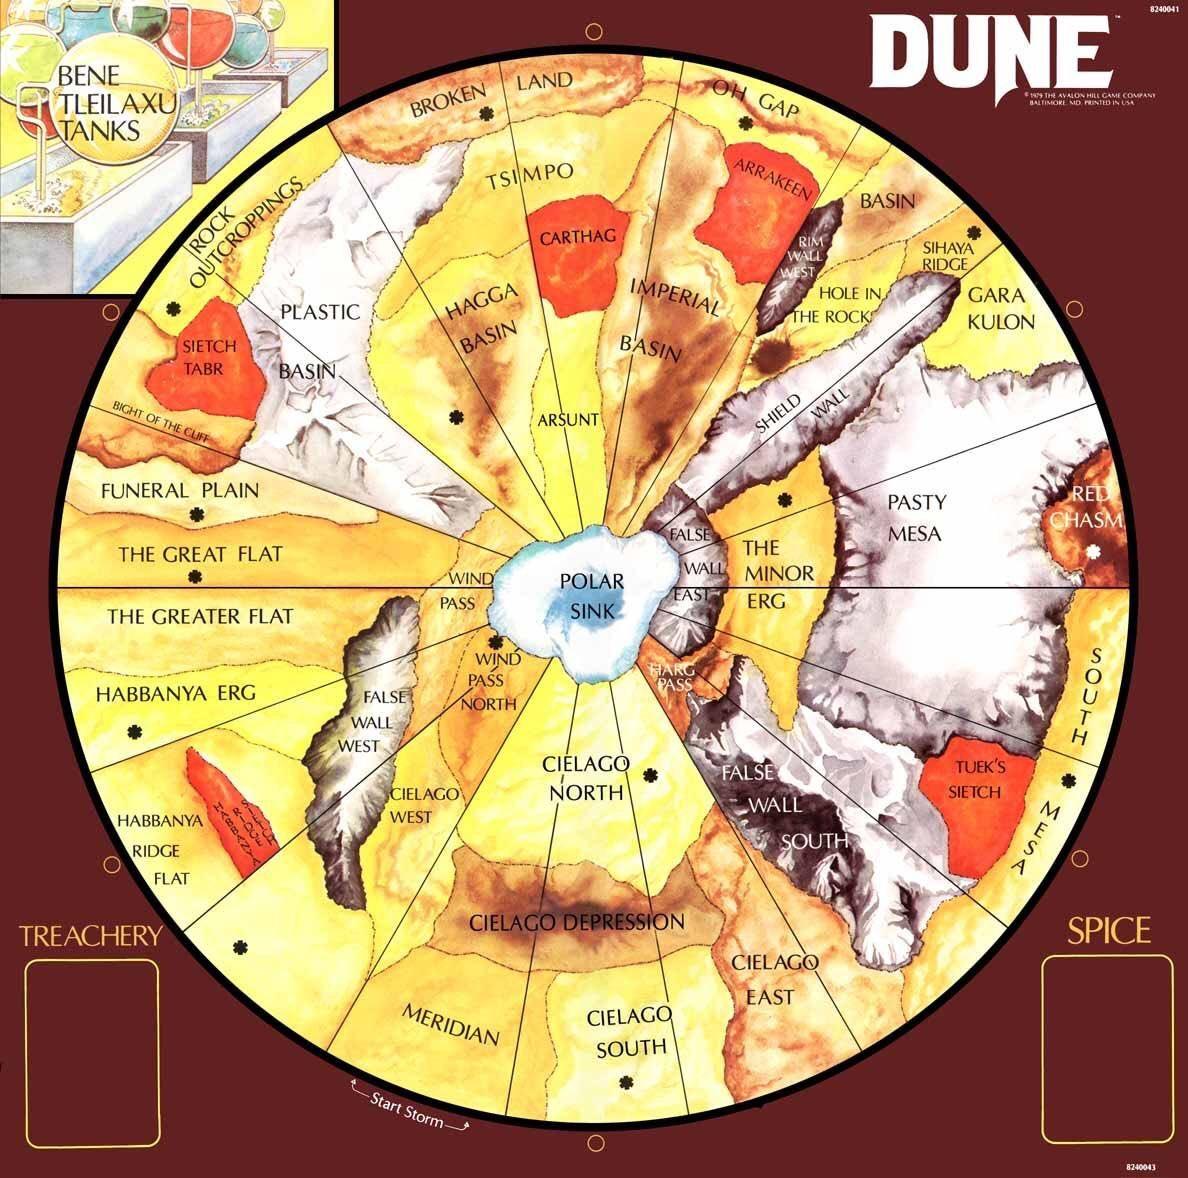 dune map https://www.youtube.com/watch?v=SkjisFHVqyg https://www.youtube.com/watch?v=SkjisFHVqyg